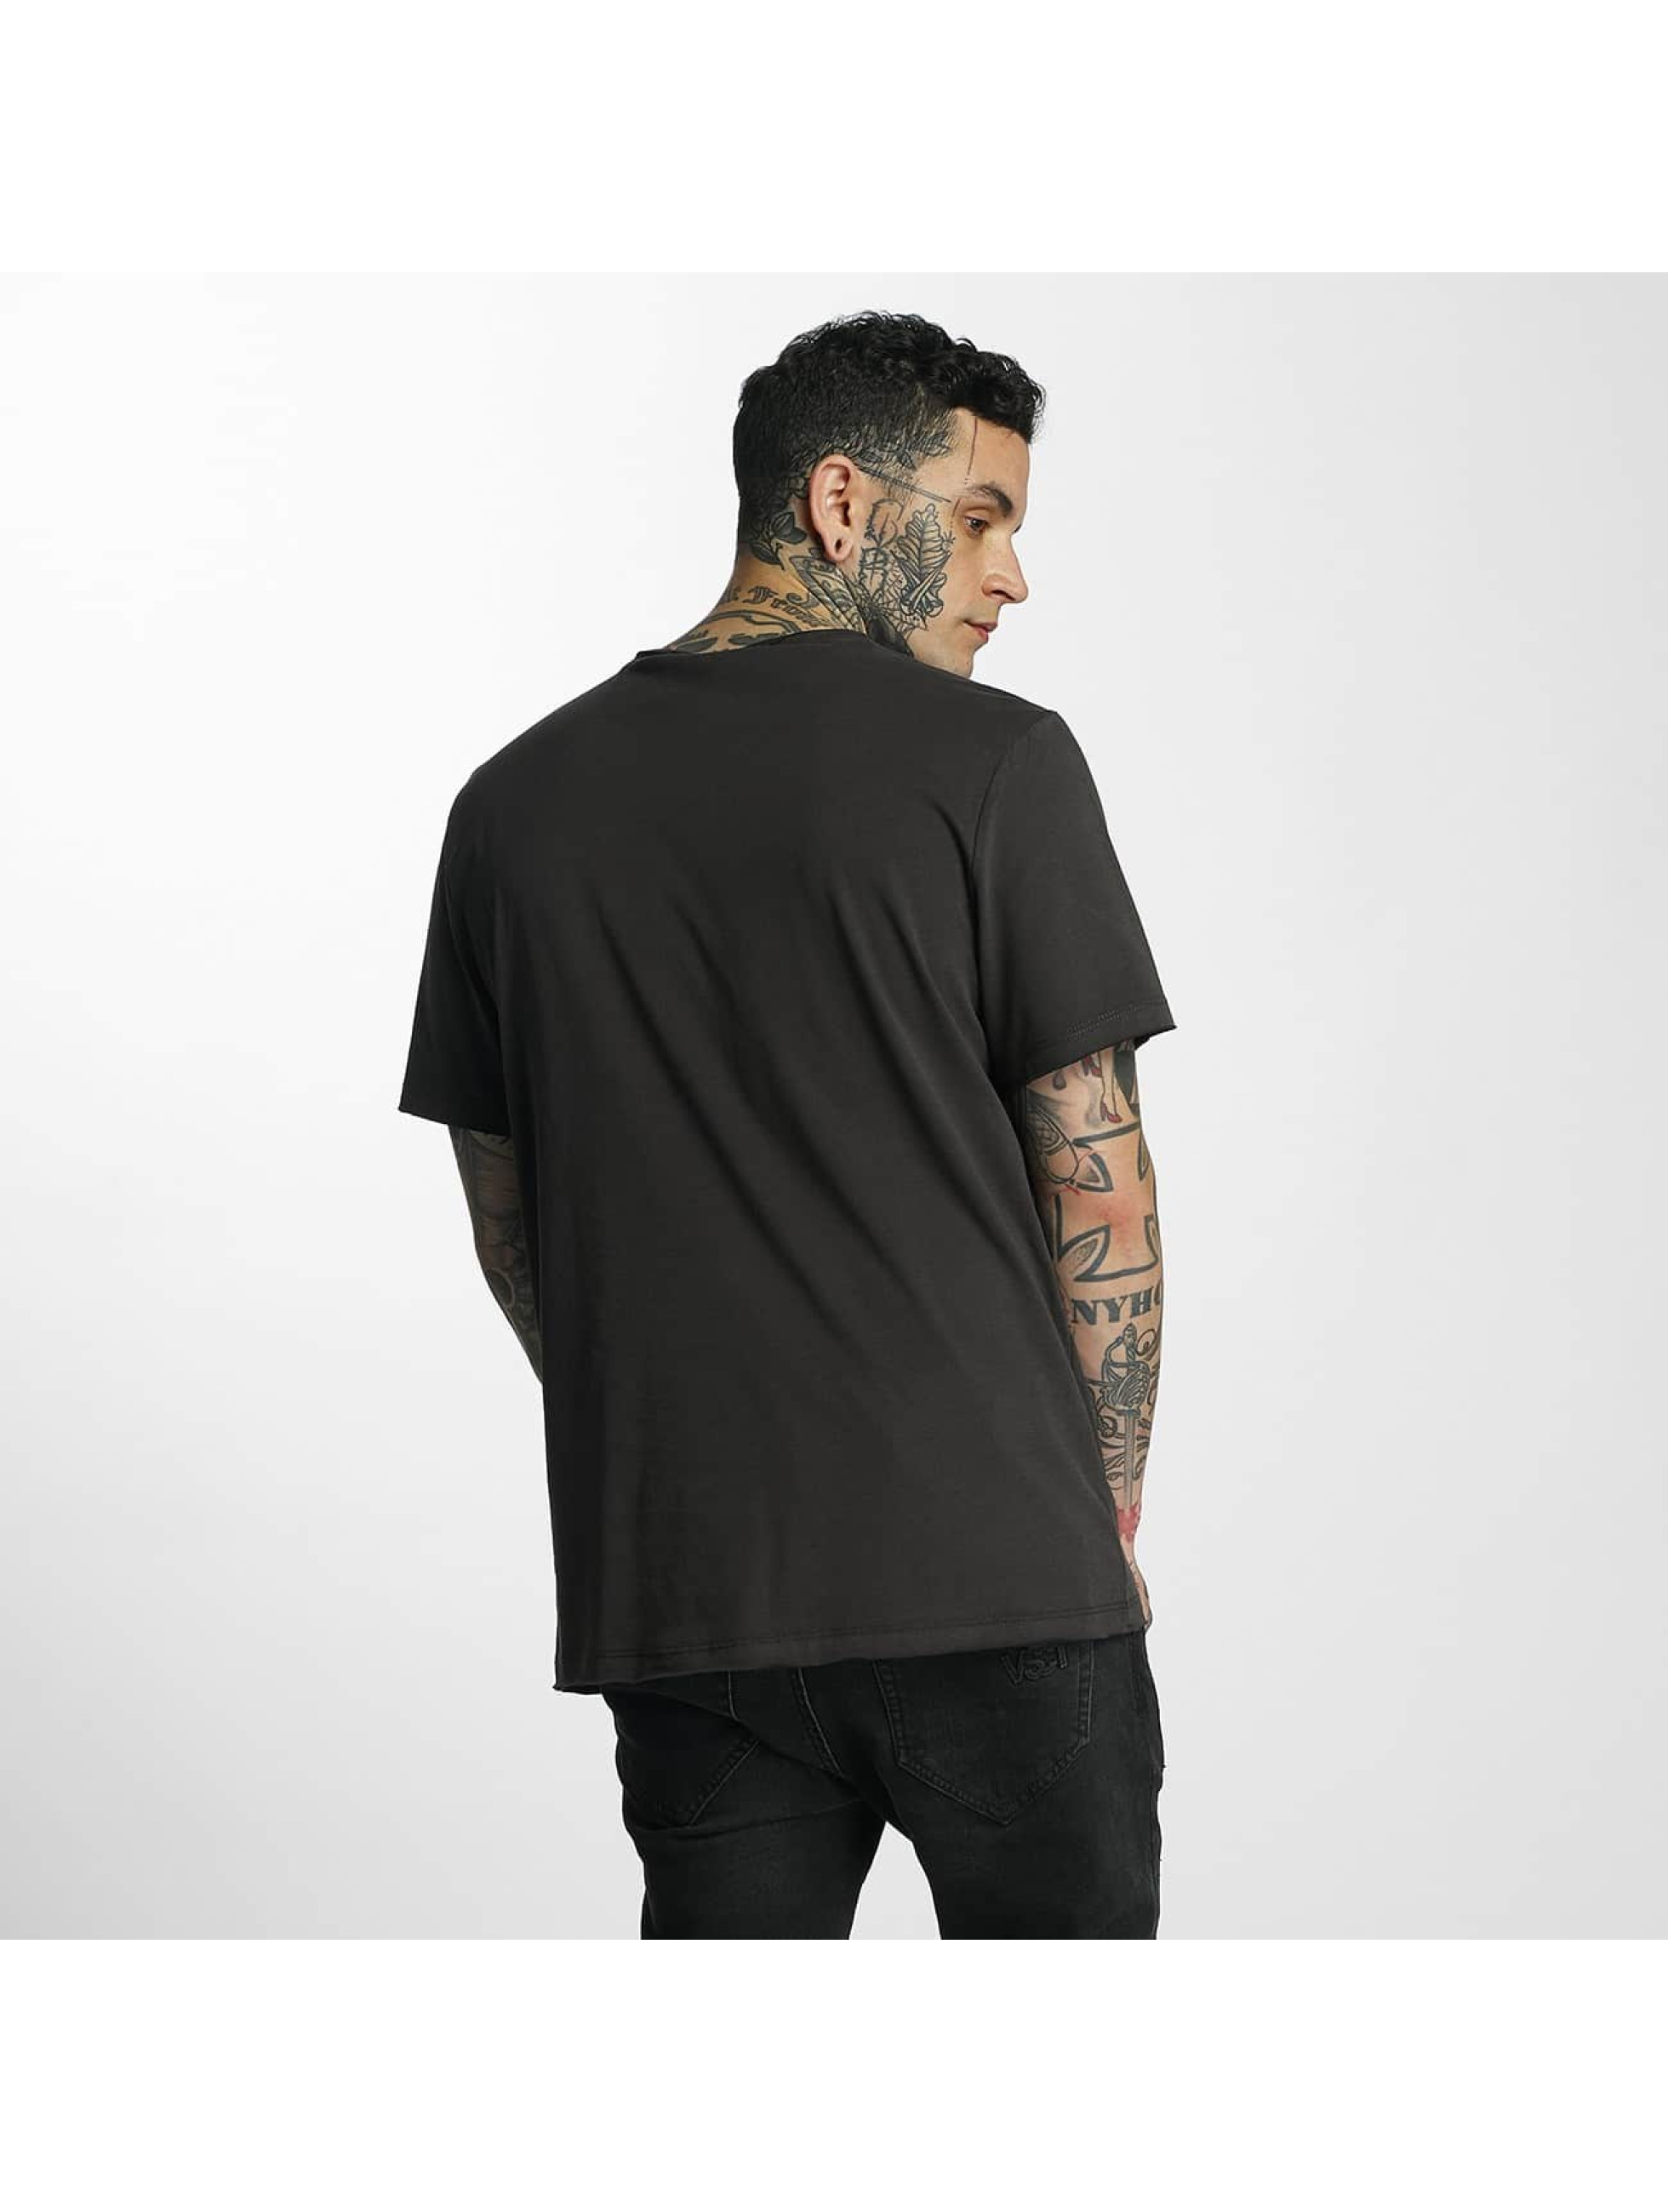 Amplified T-Shirt Slayer Metal Edge grey